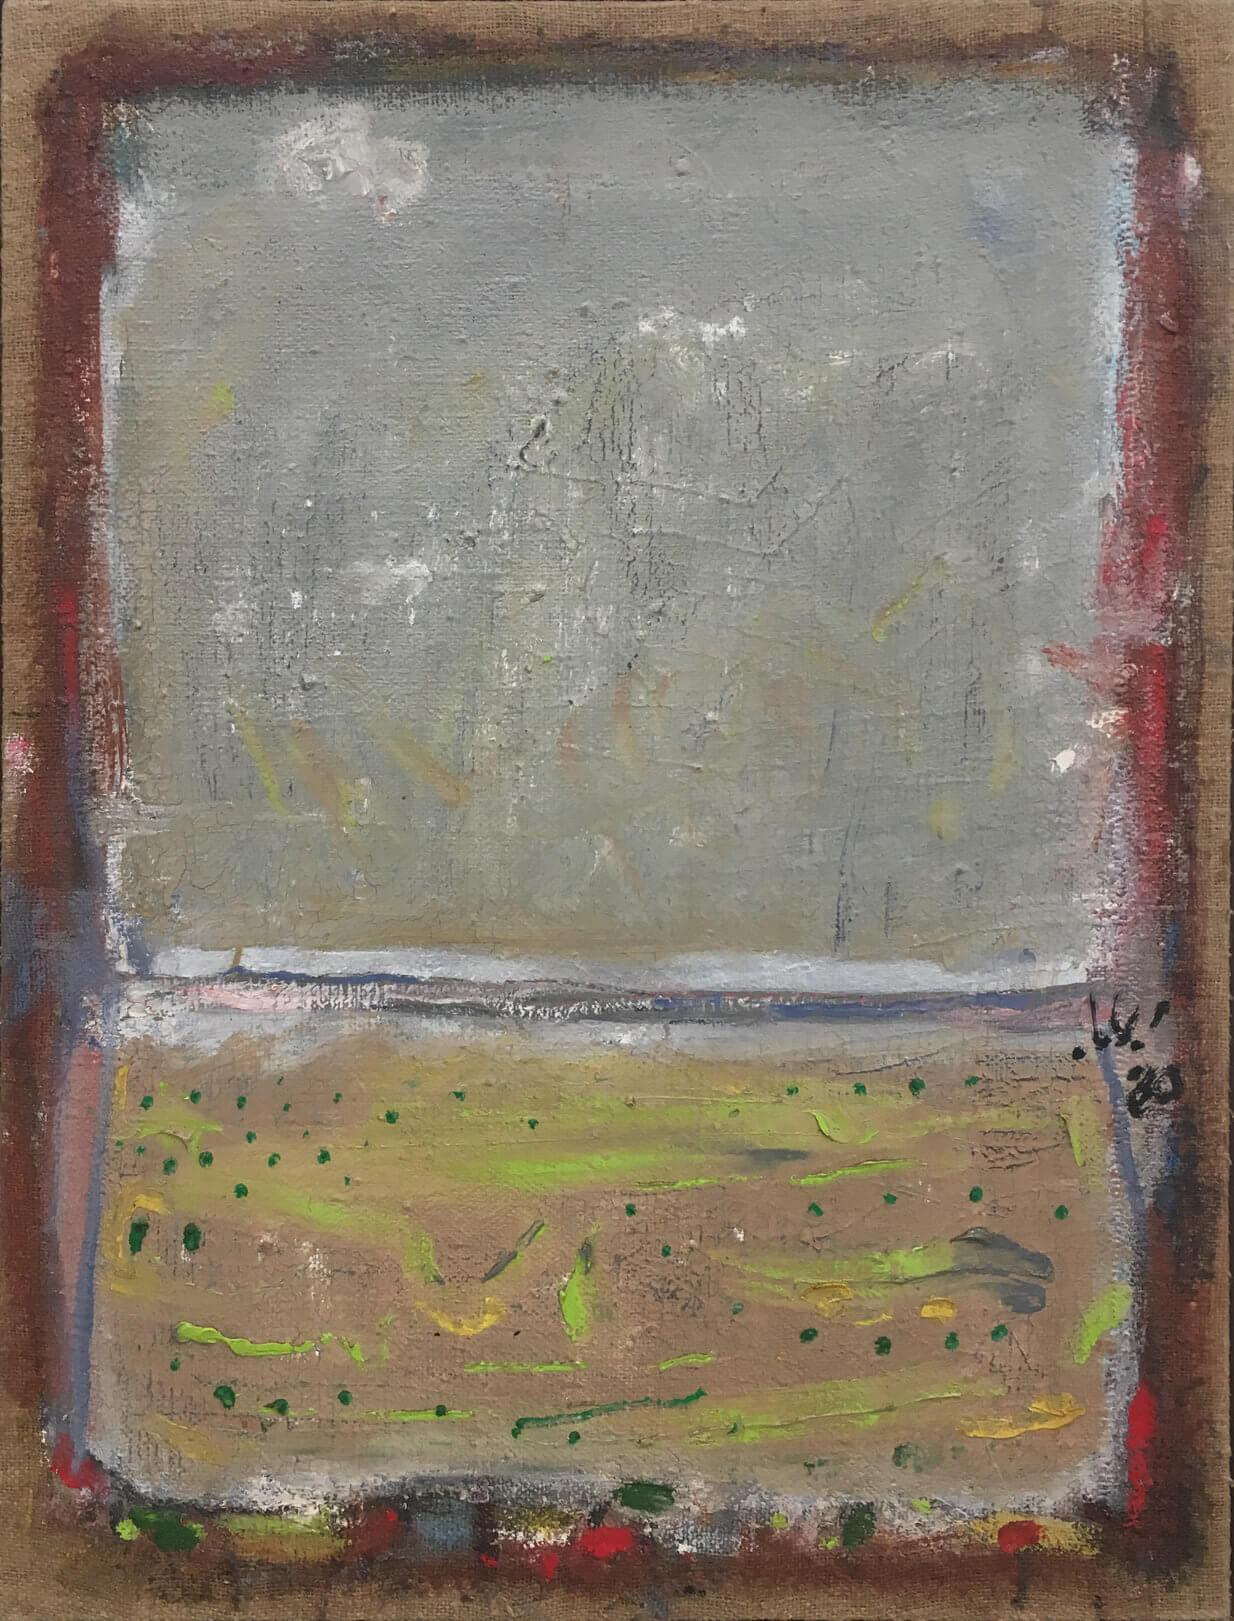 1476_Yehezkel Streichman, 1980, Mixed media on burlap, 80x59 cm 9,500$-1234x1621